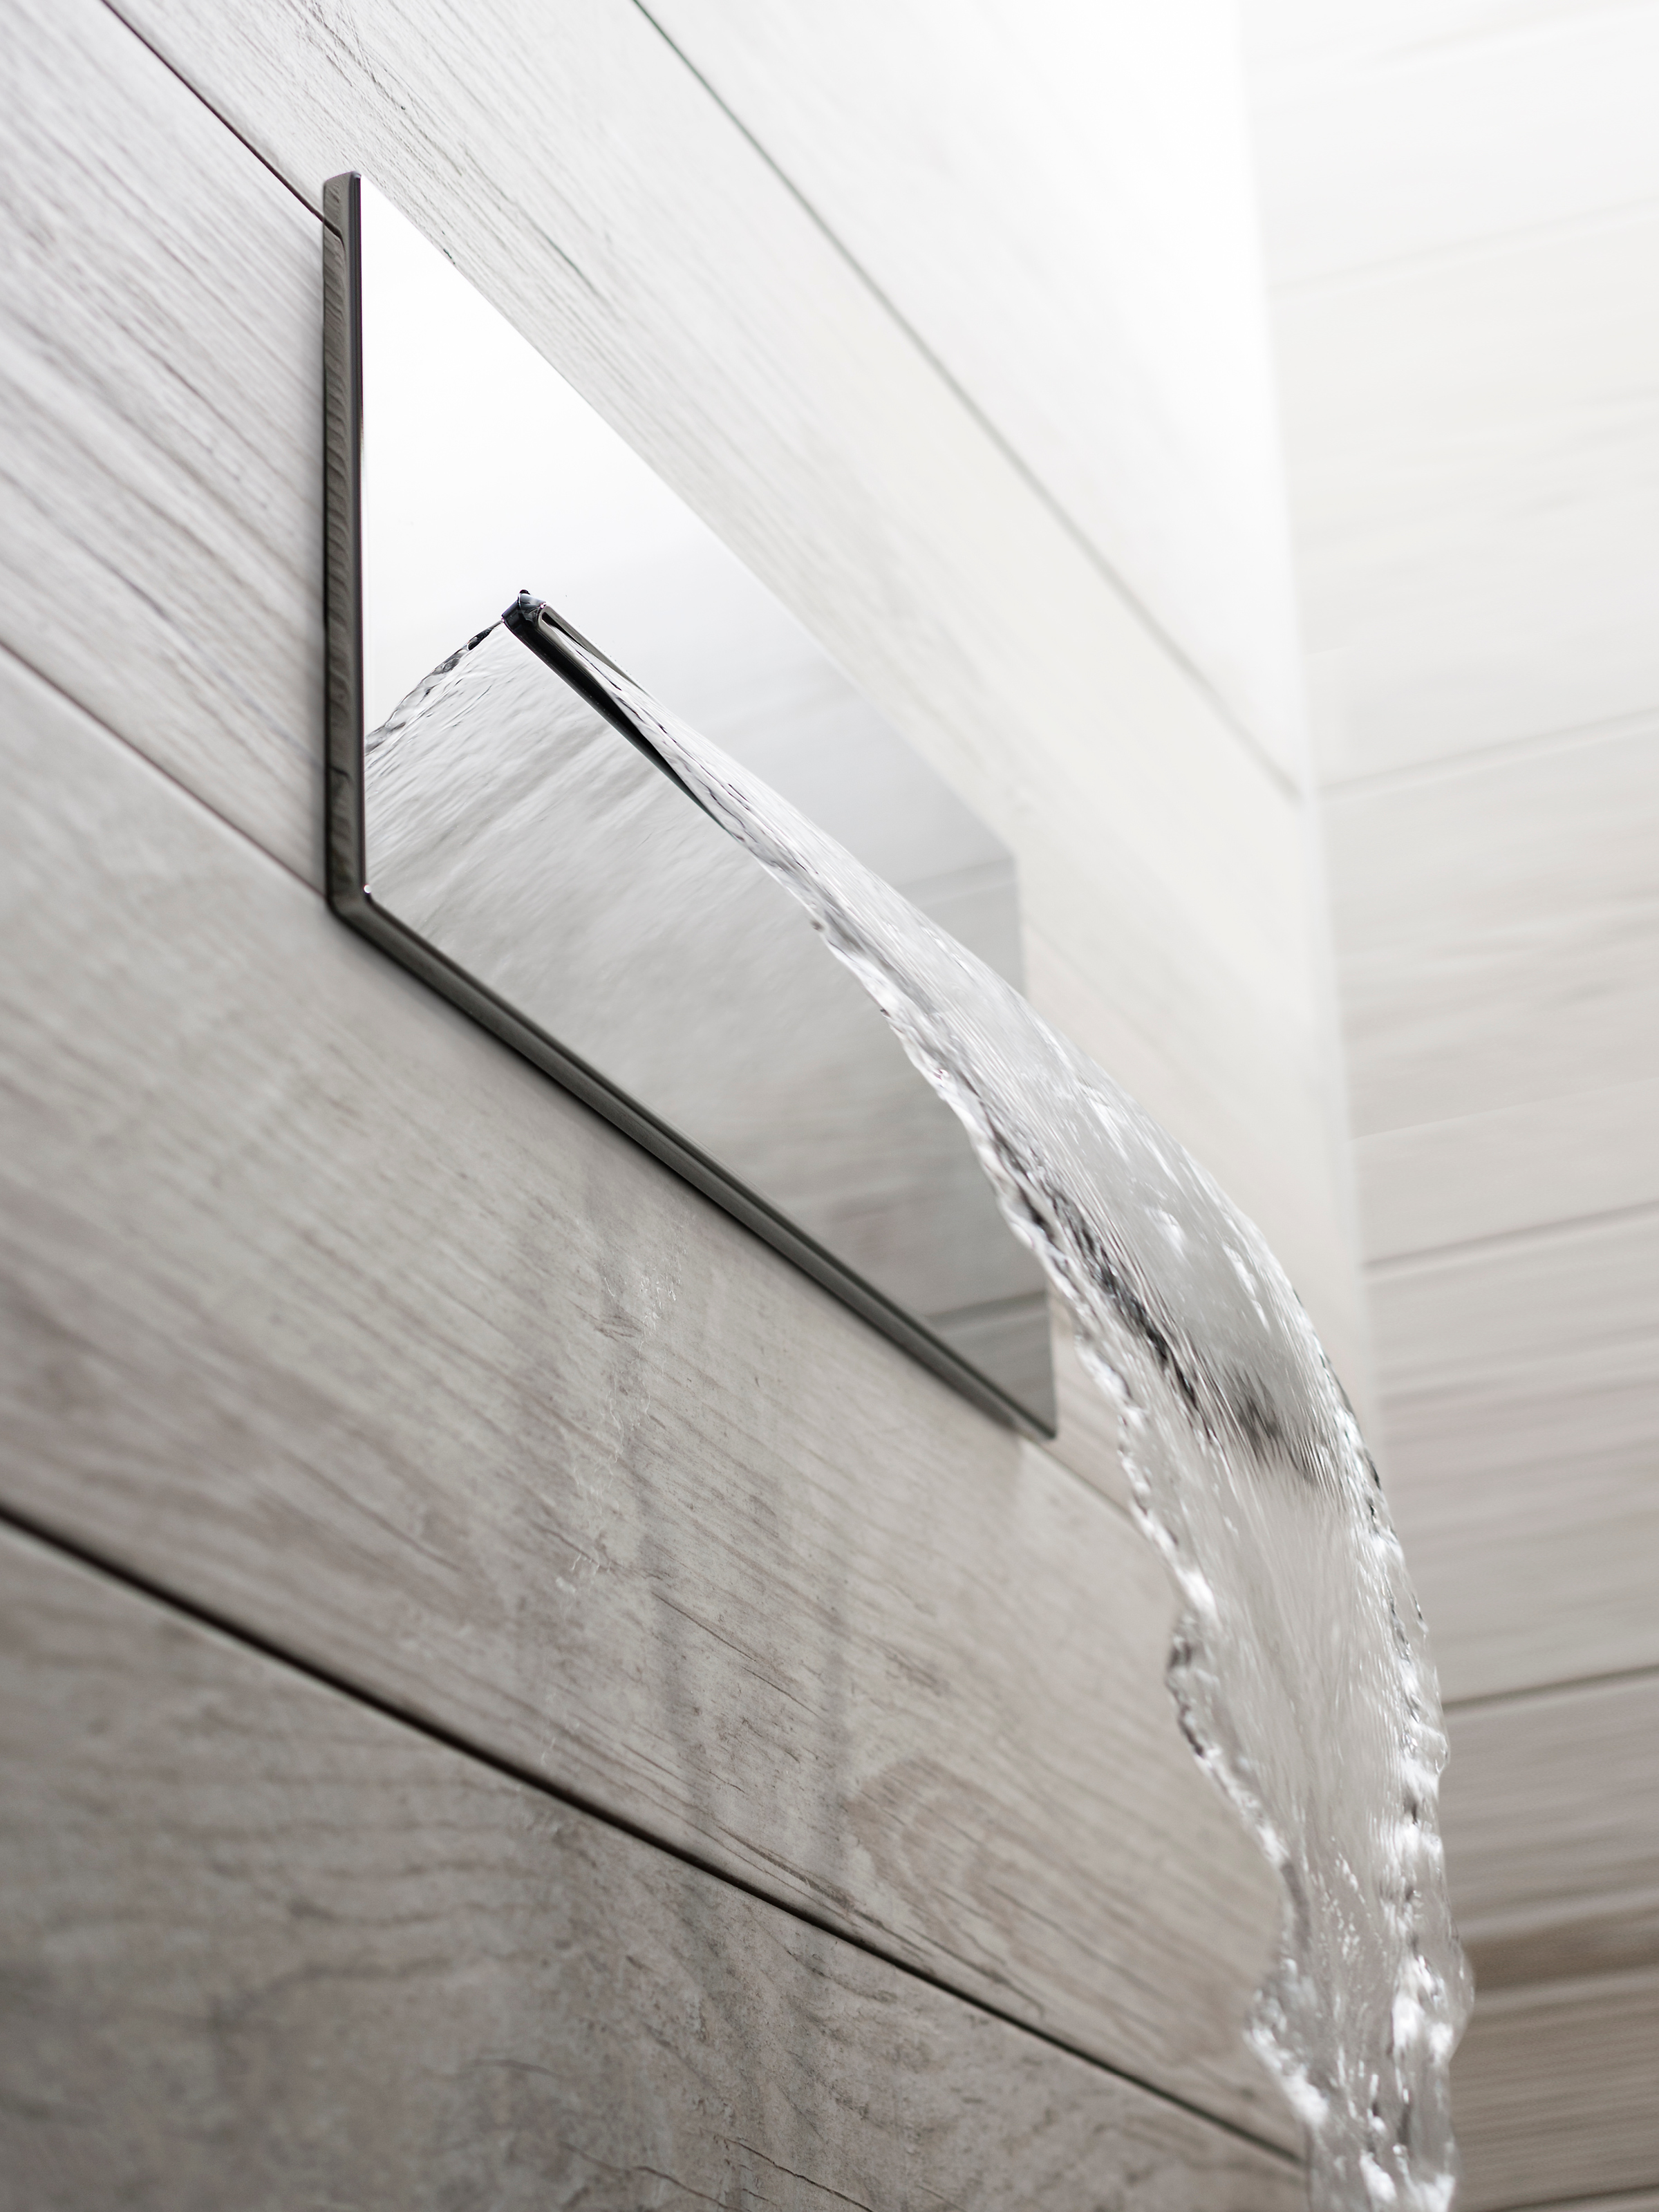 shower jets water pressure itm head nuvita chrome finish wide high waterfall